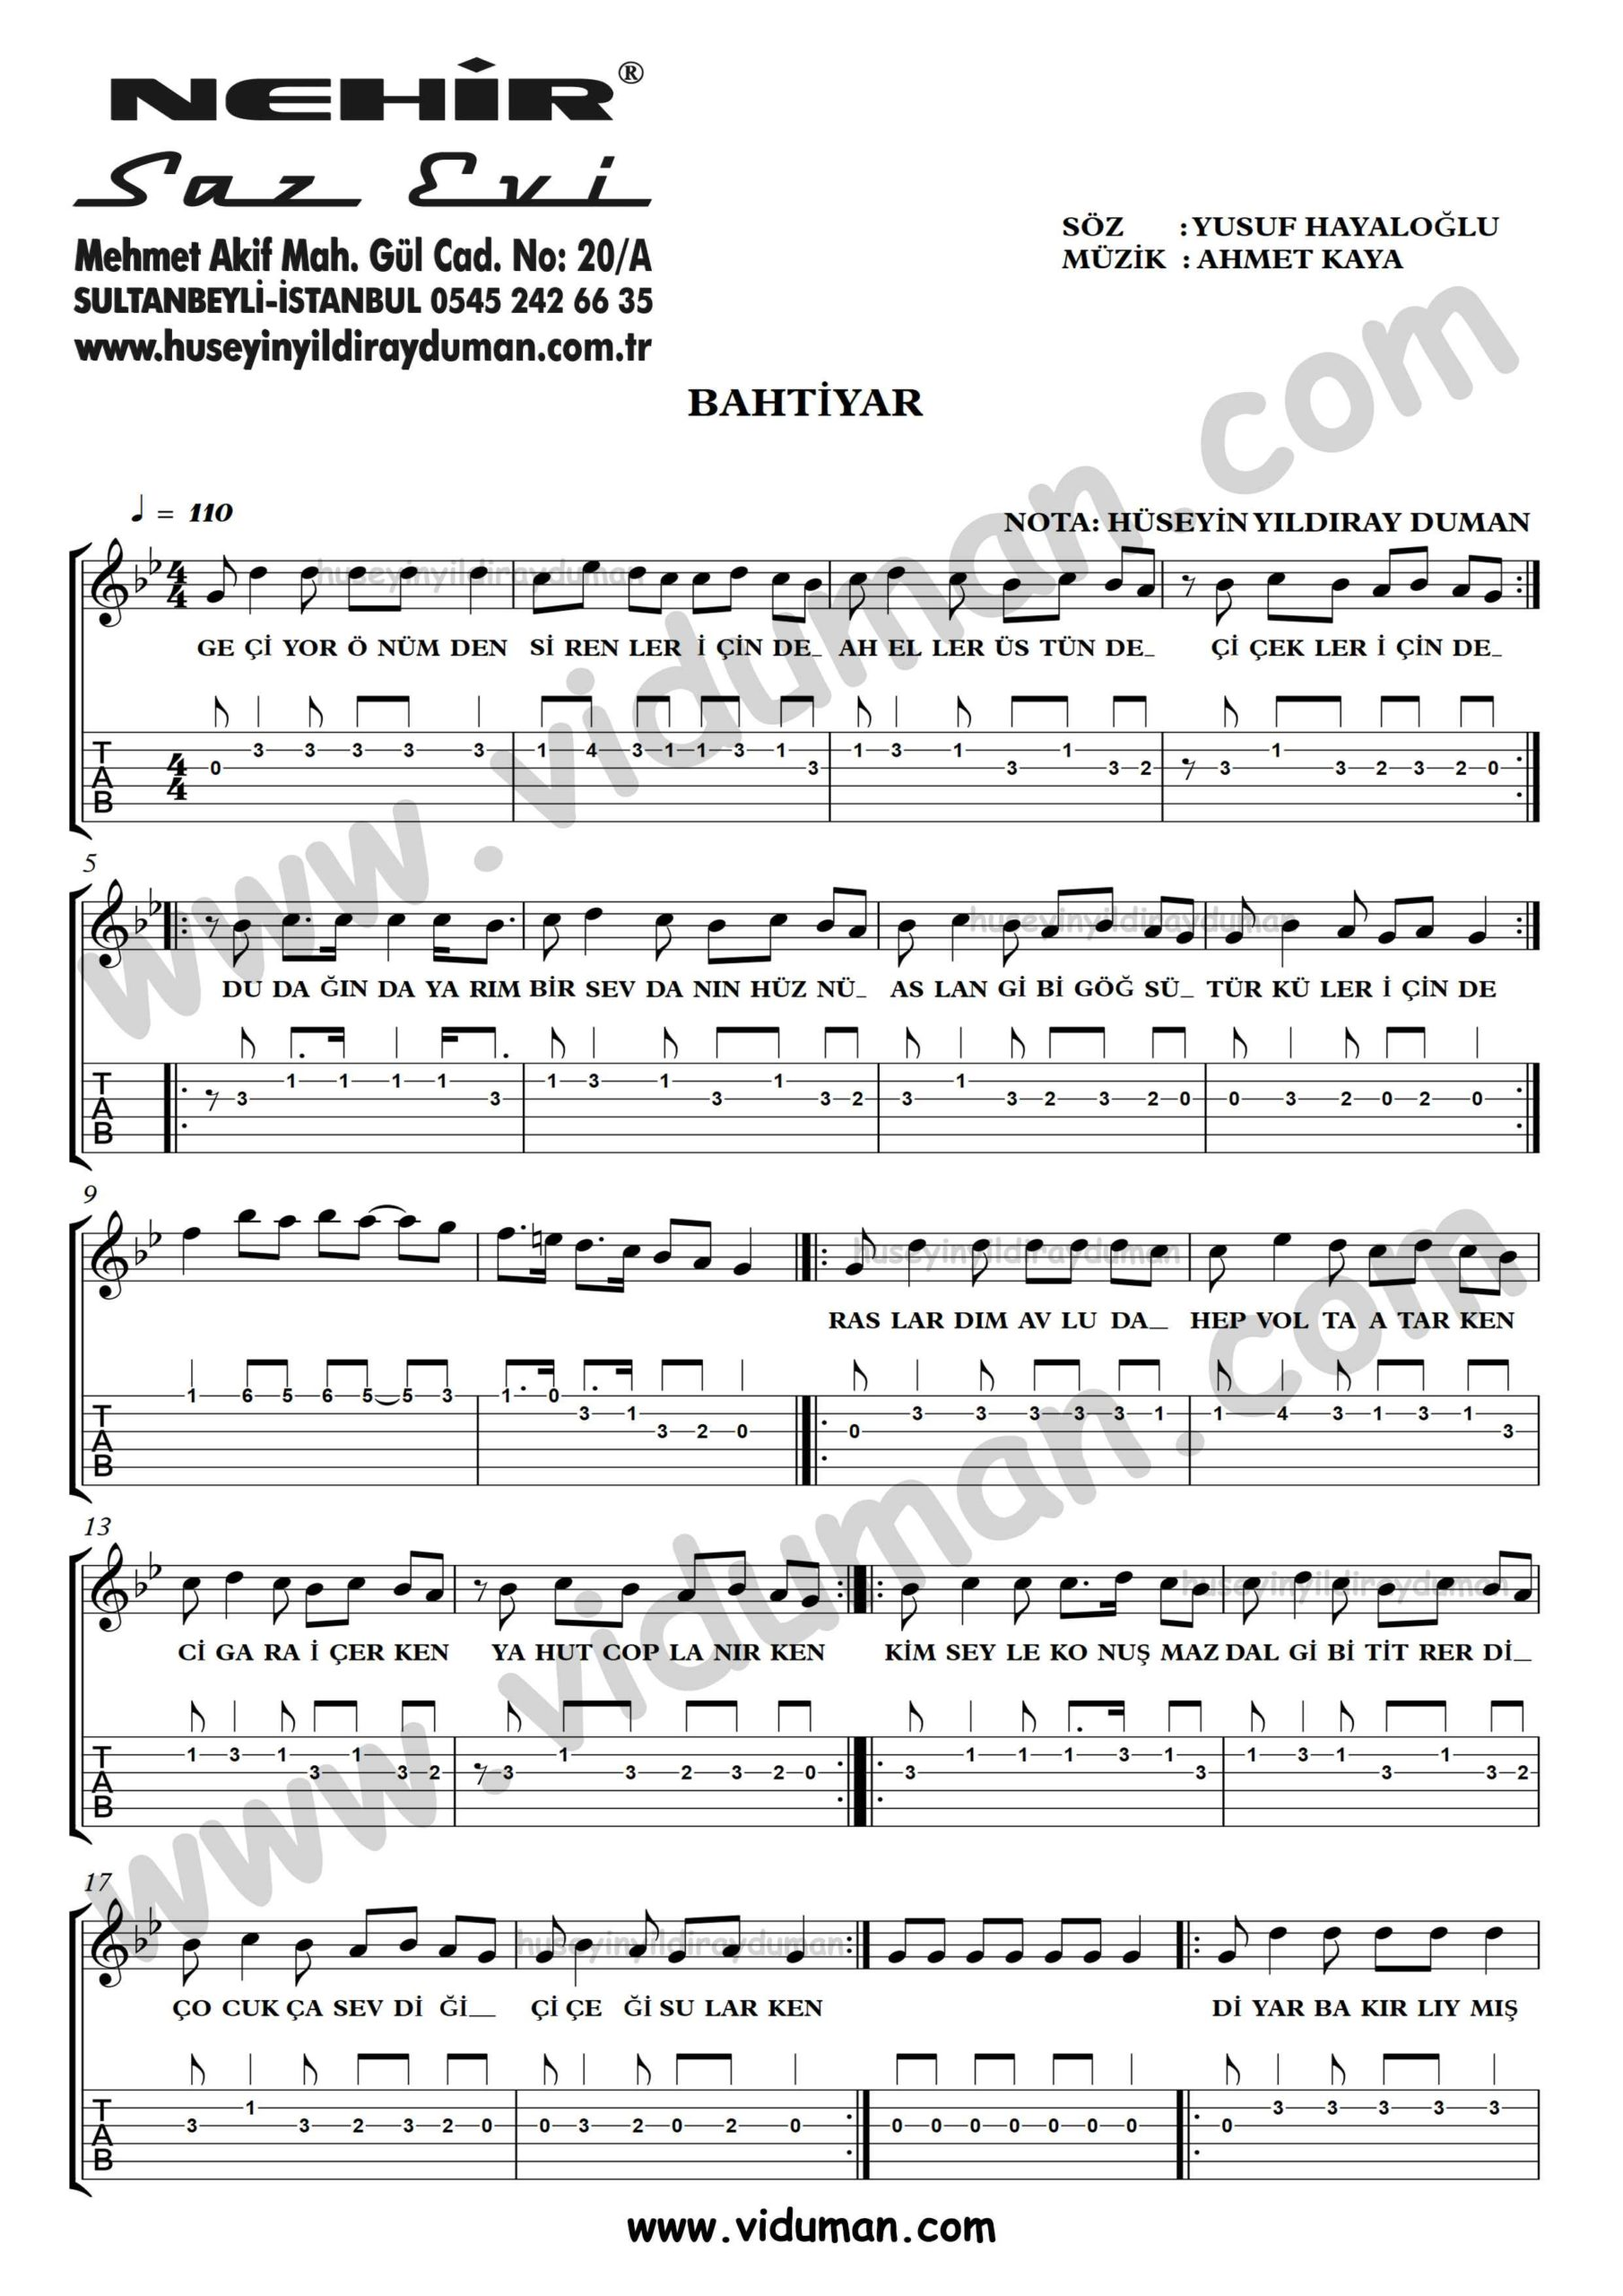 Bahtiyar_1-Ahmet Kaya-Gitar Tab-Solo Notalari